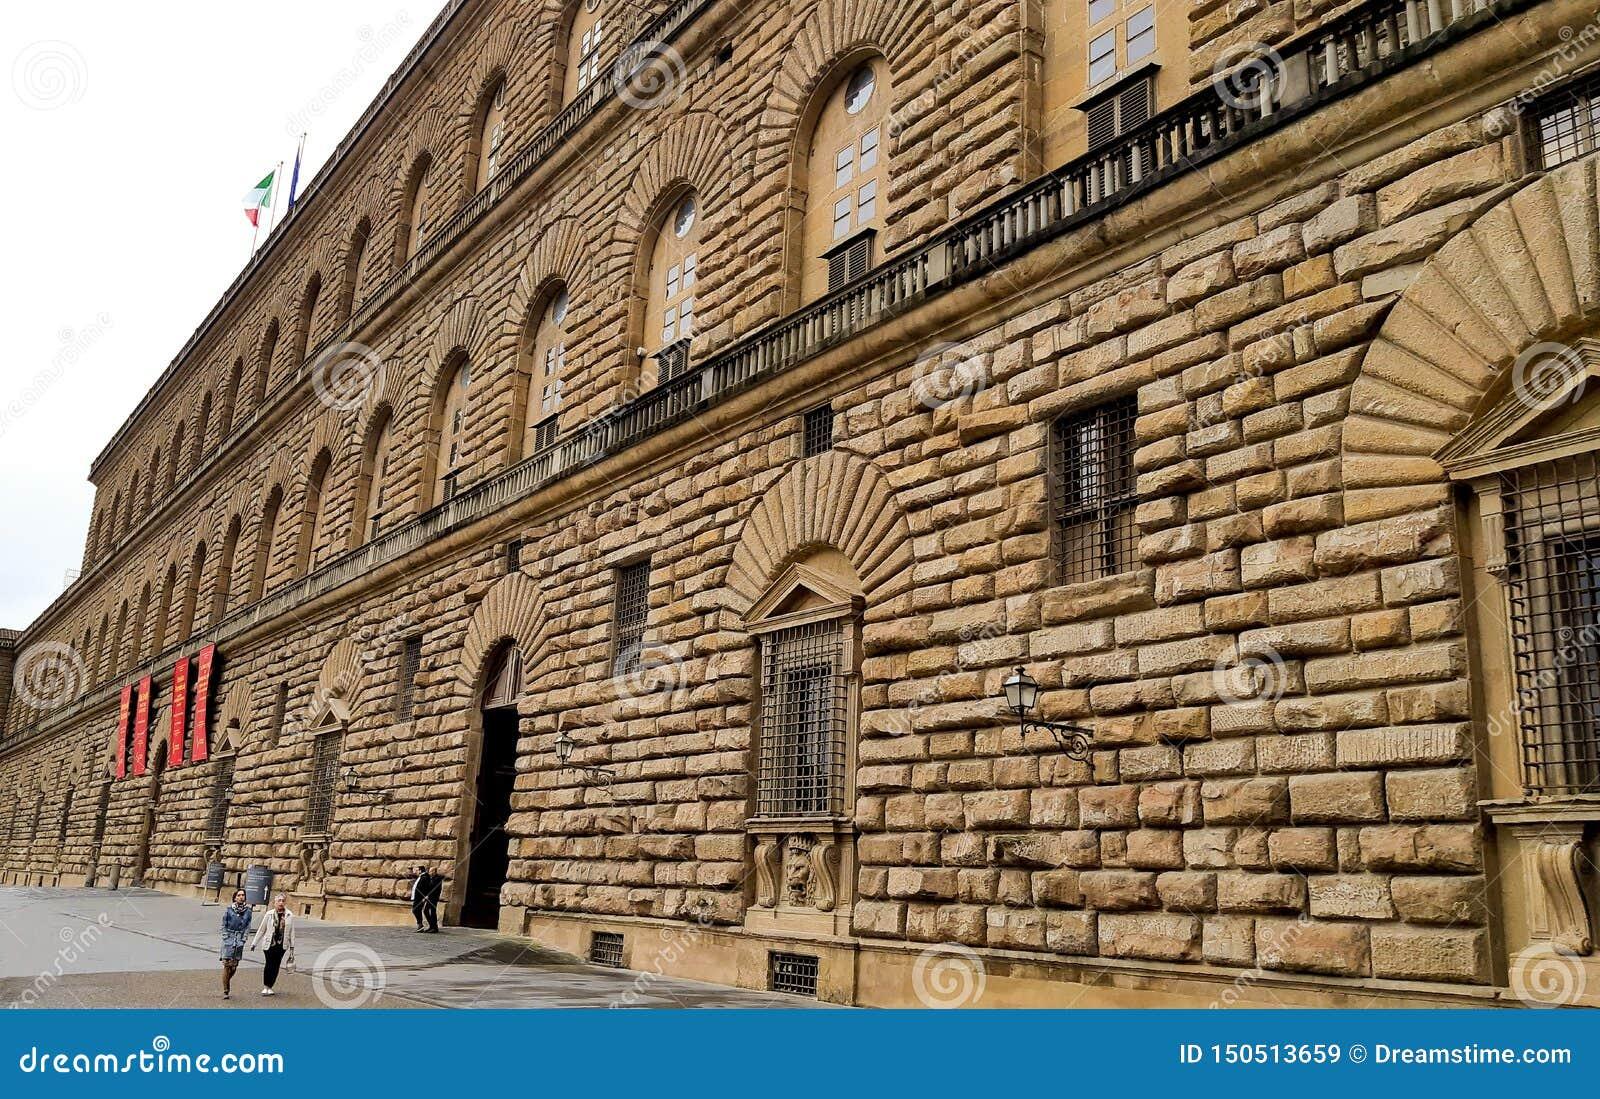 Museum för slottFlorence Italy Europe architecturethe